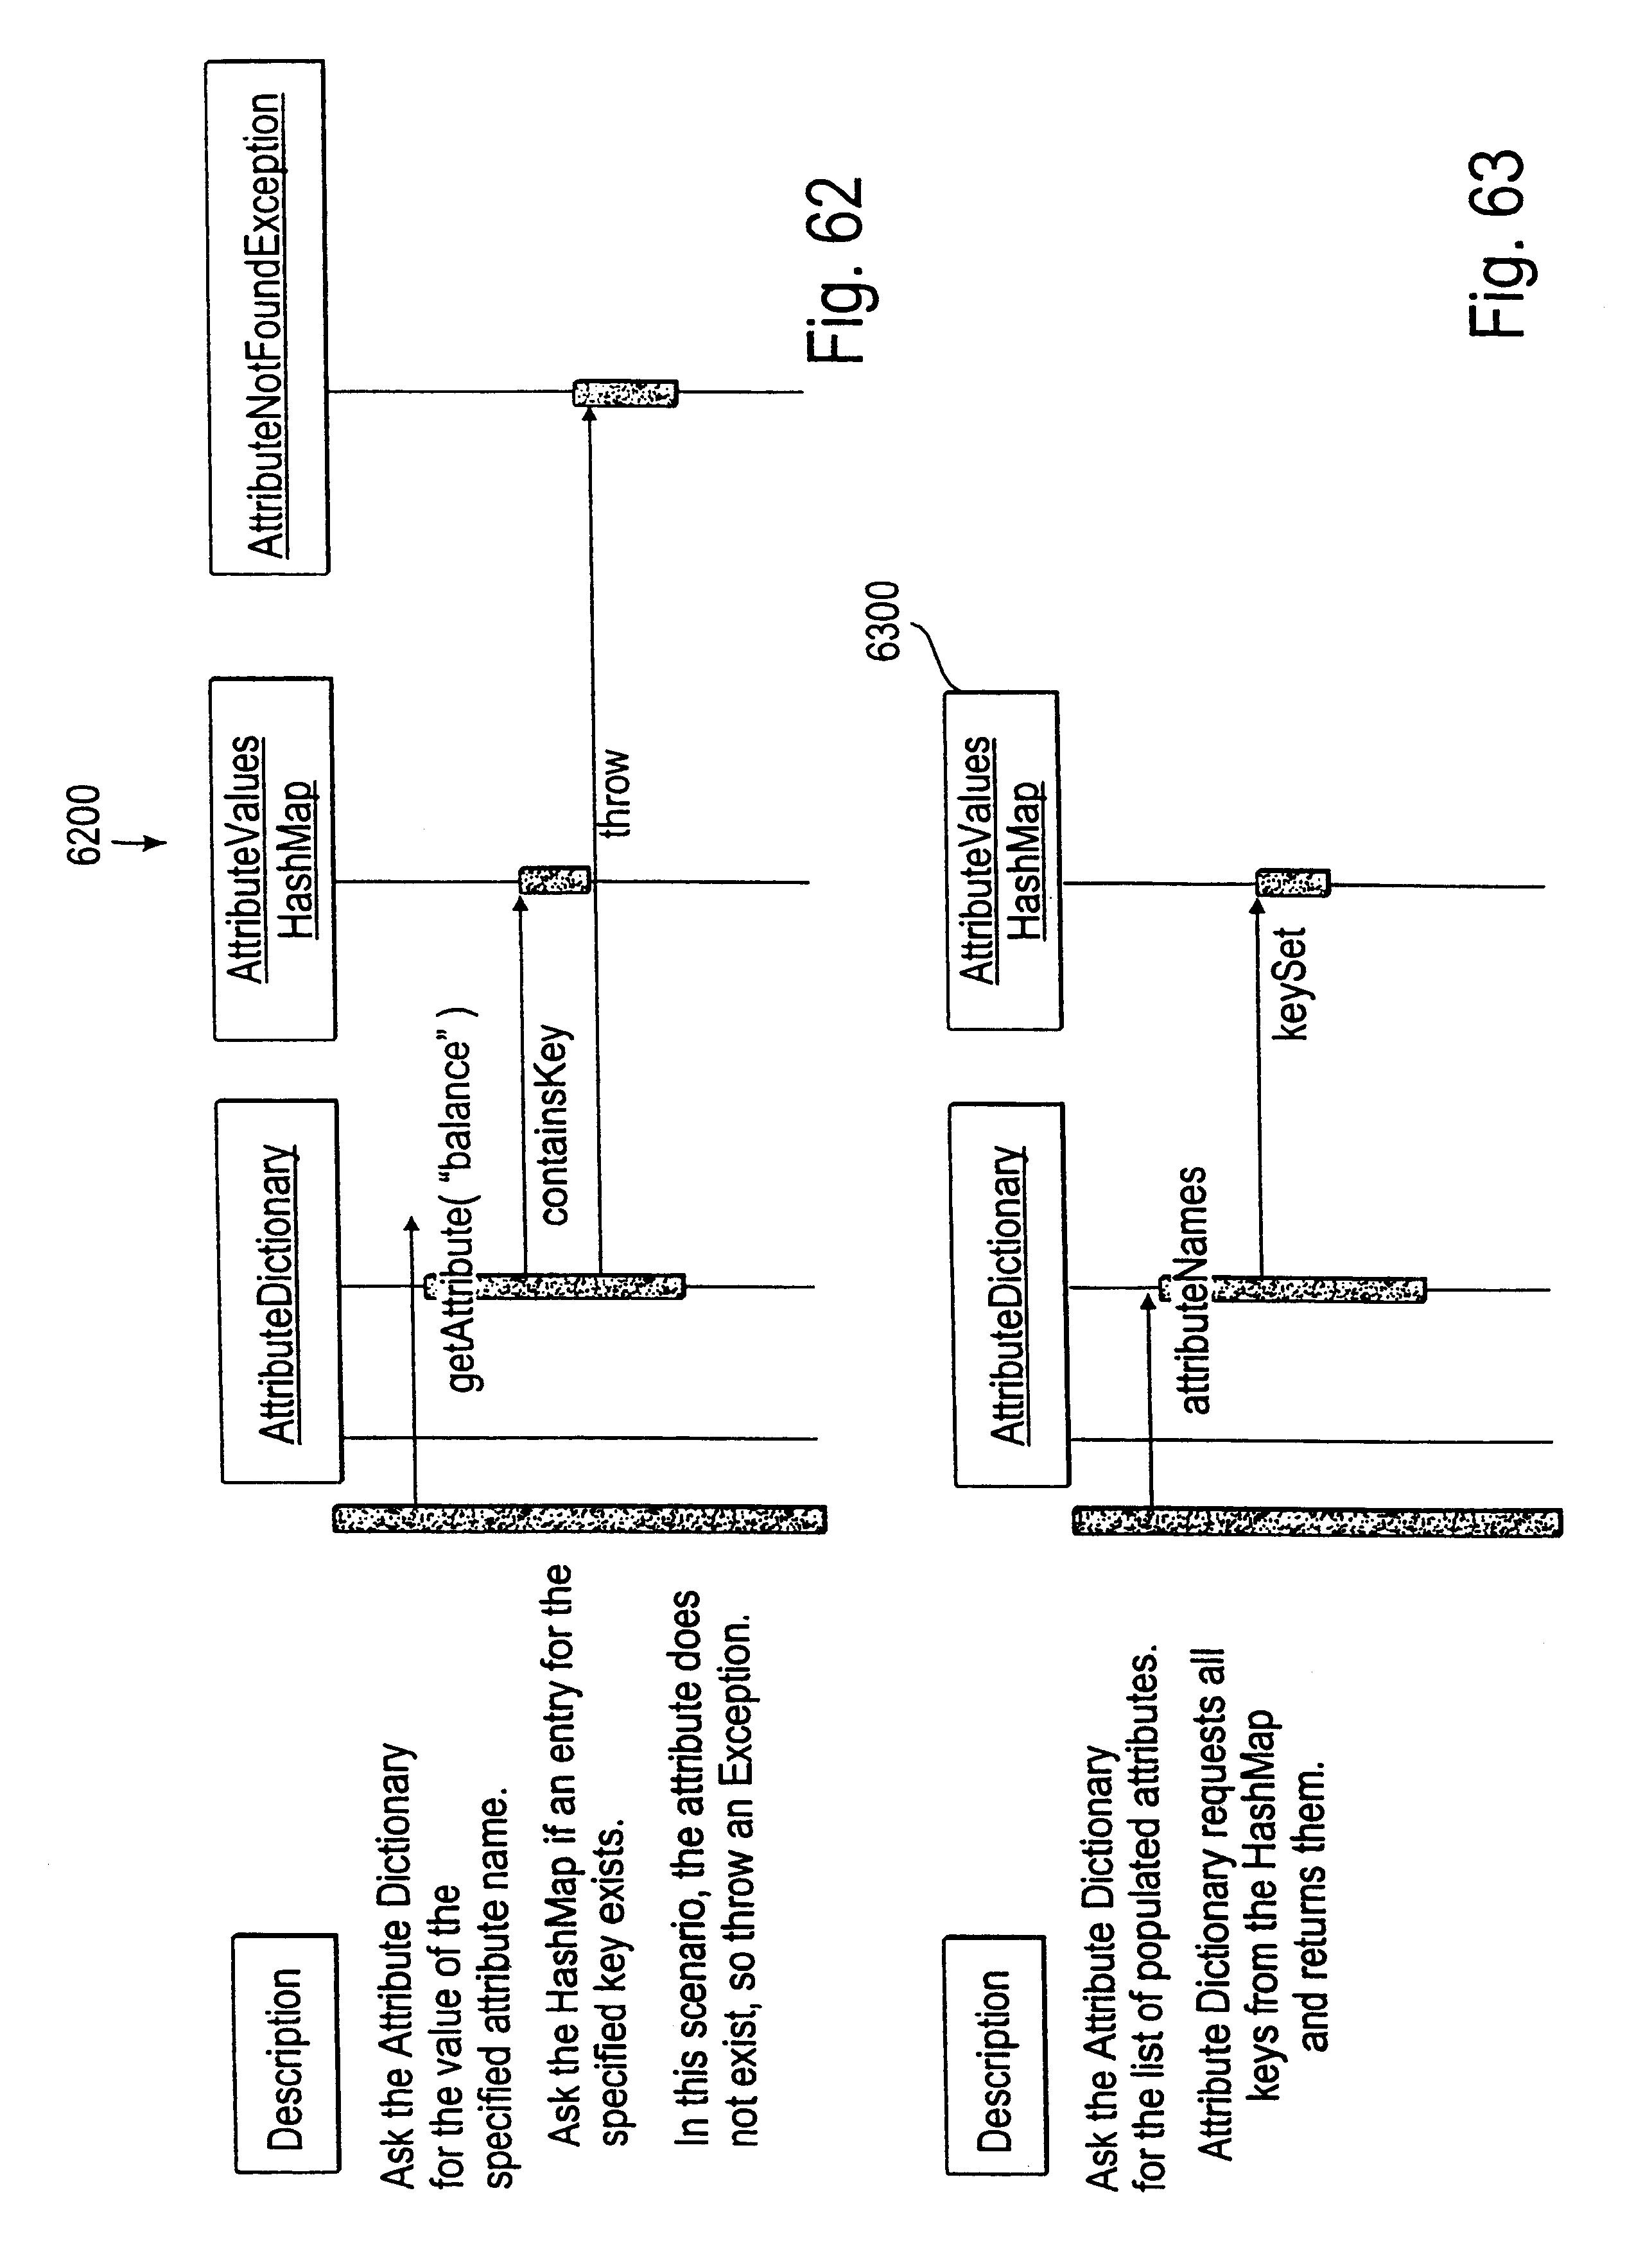 lcd light wiring diagram wiring diagram var lcd light wiring diagram wiring diagram lcd light wiring diagram